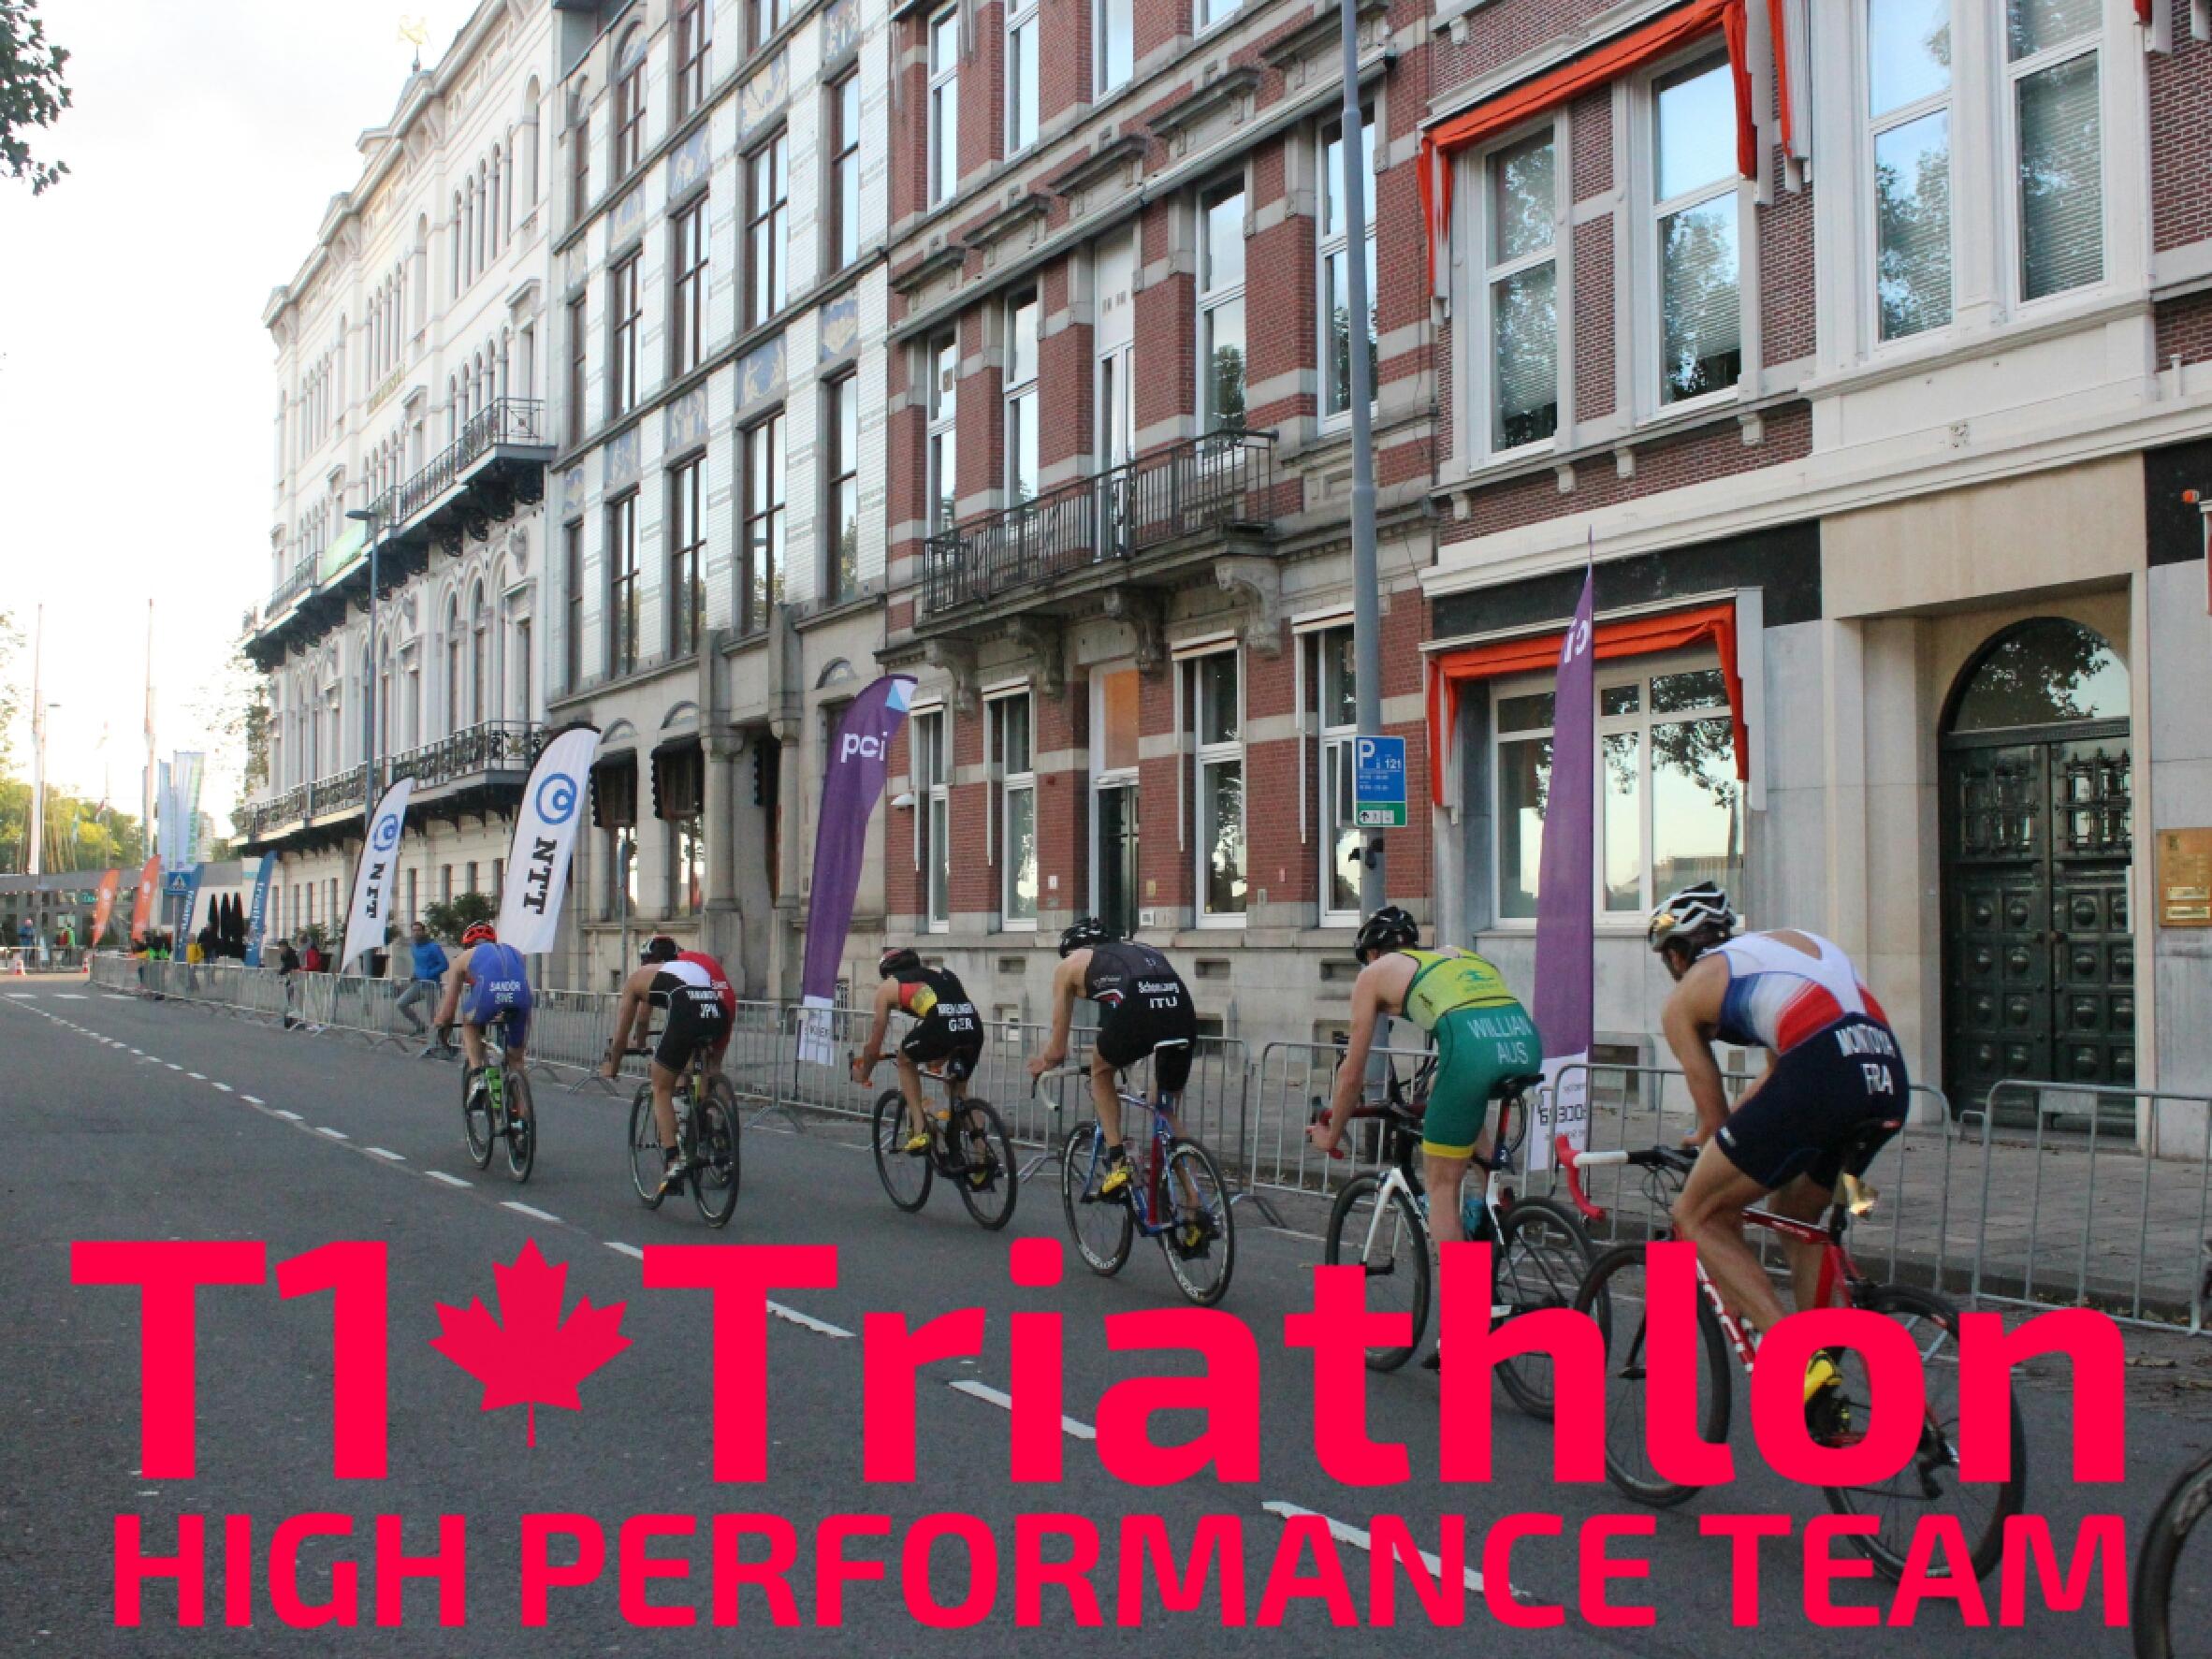 T1 Triathlon High Performance Team in Rotterdam